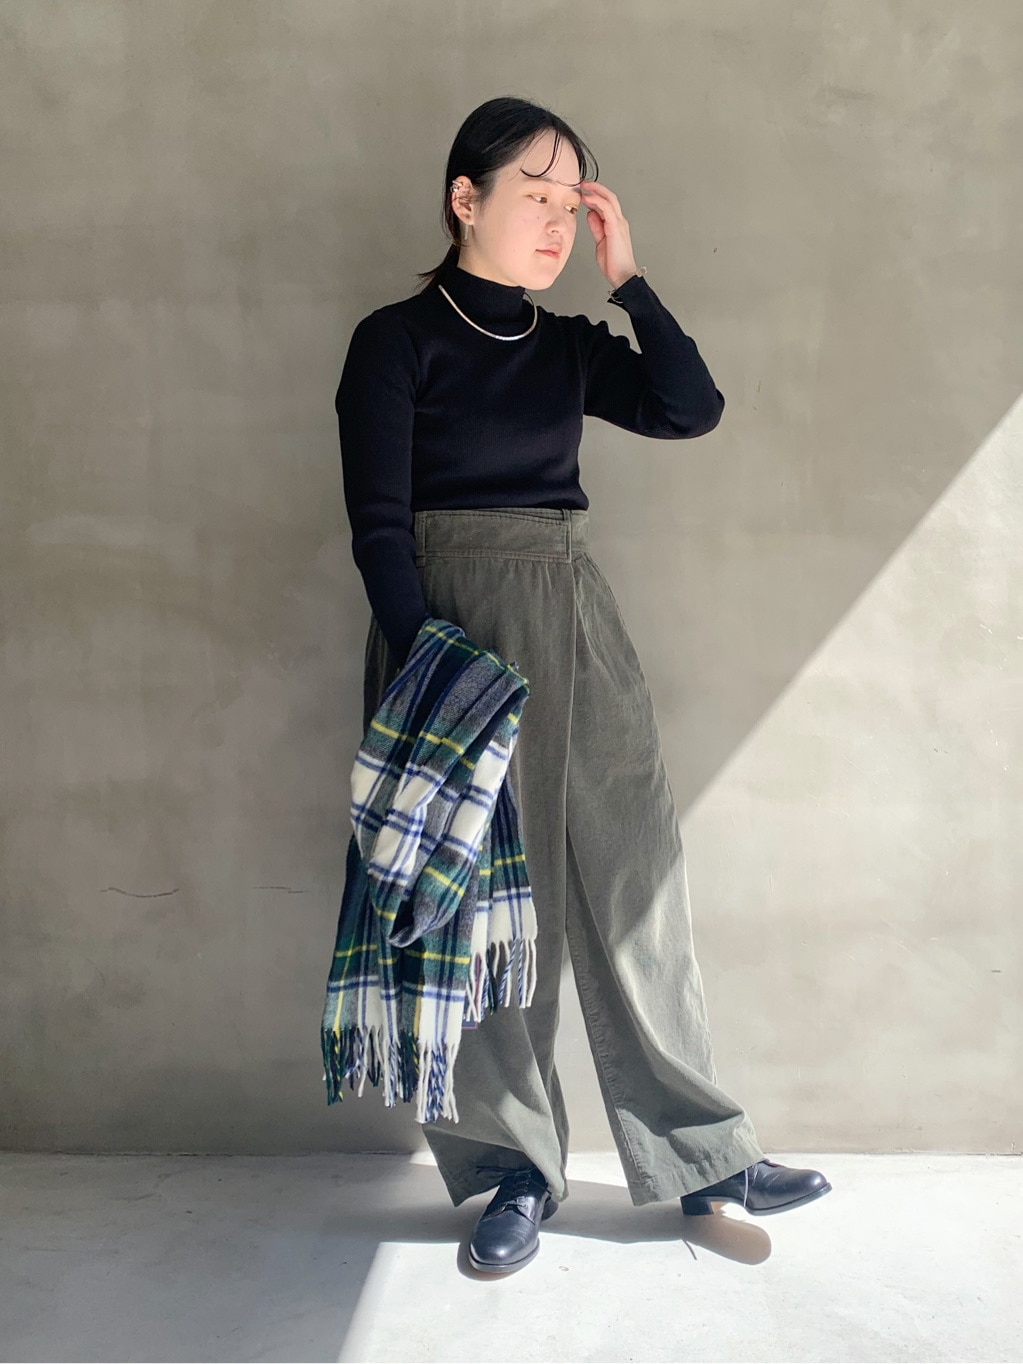 caph troupe 福岡薬院路面 身長:148cm 2020.10.07